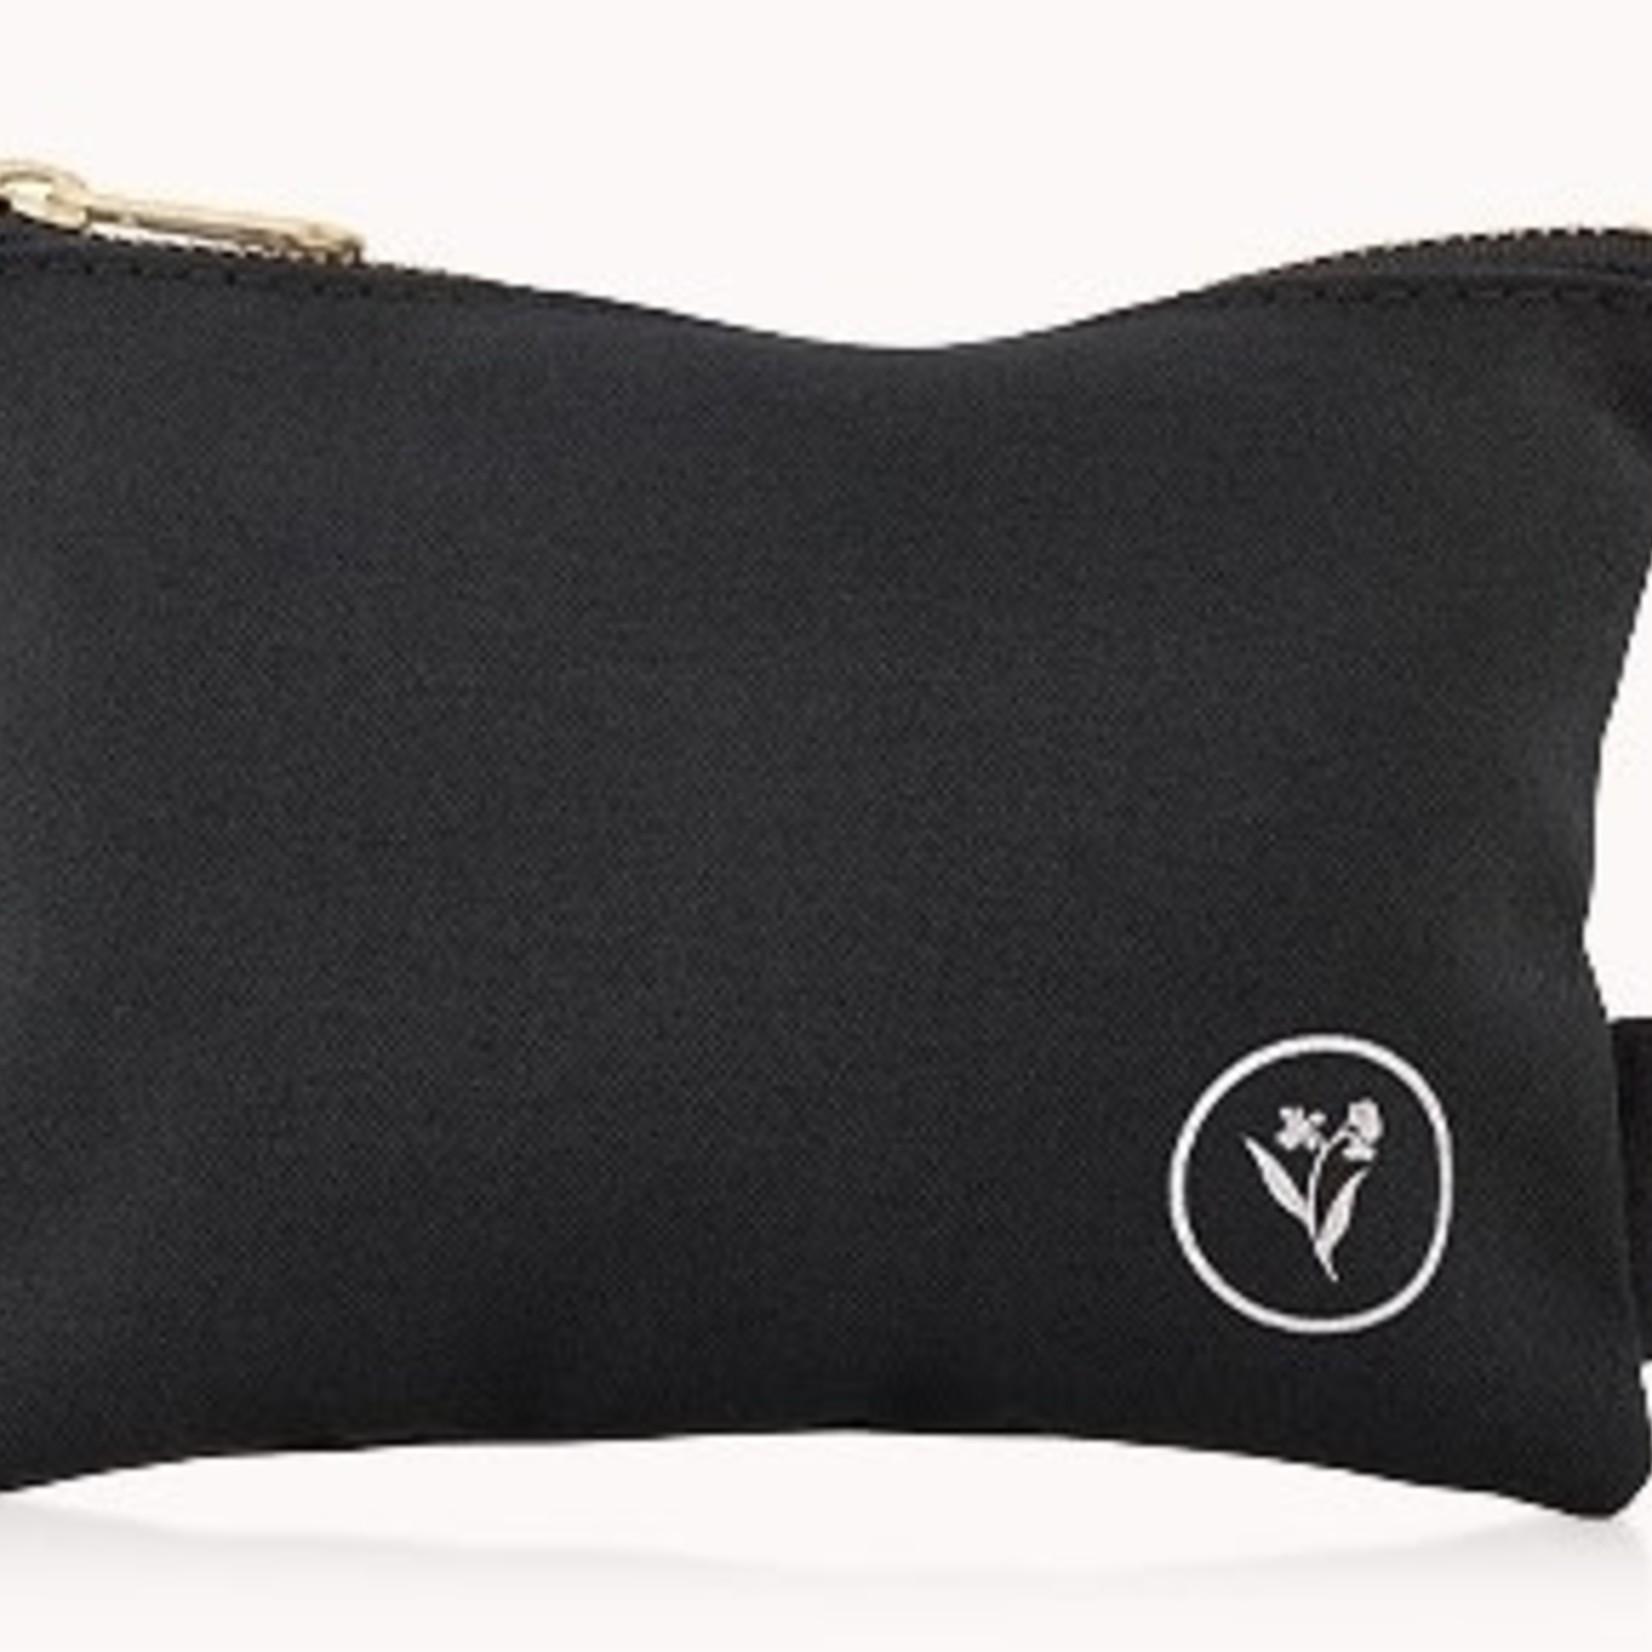 AVEDA Fabric Travel Product Bag